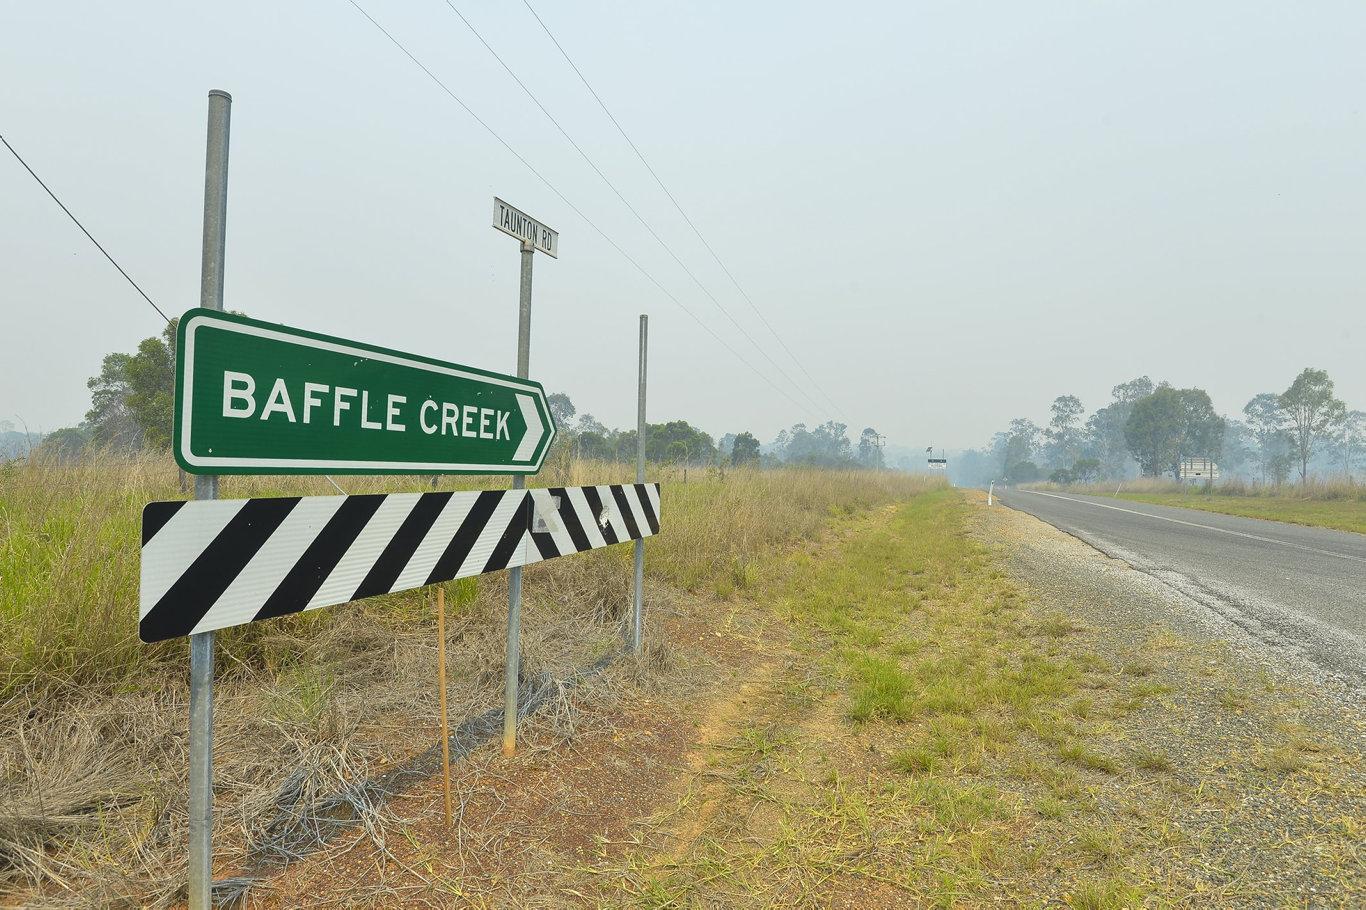 Baffle Creek is now in the firing line of the devastating bushfire.